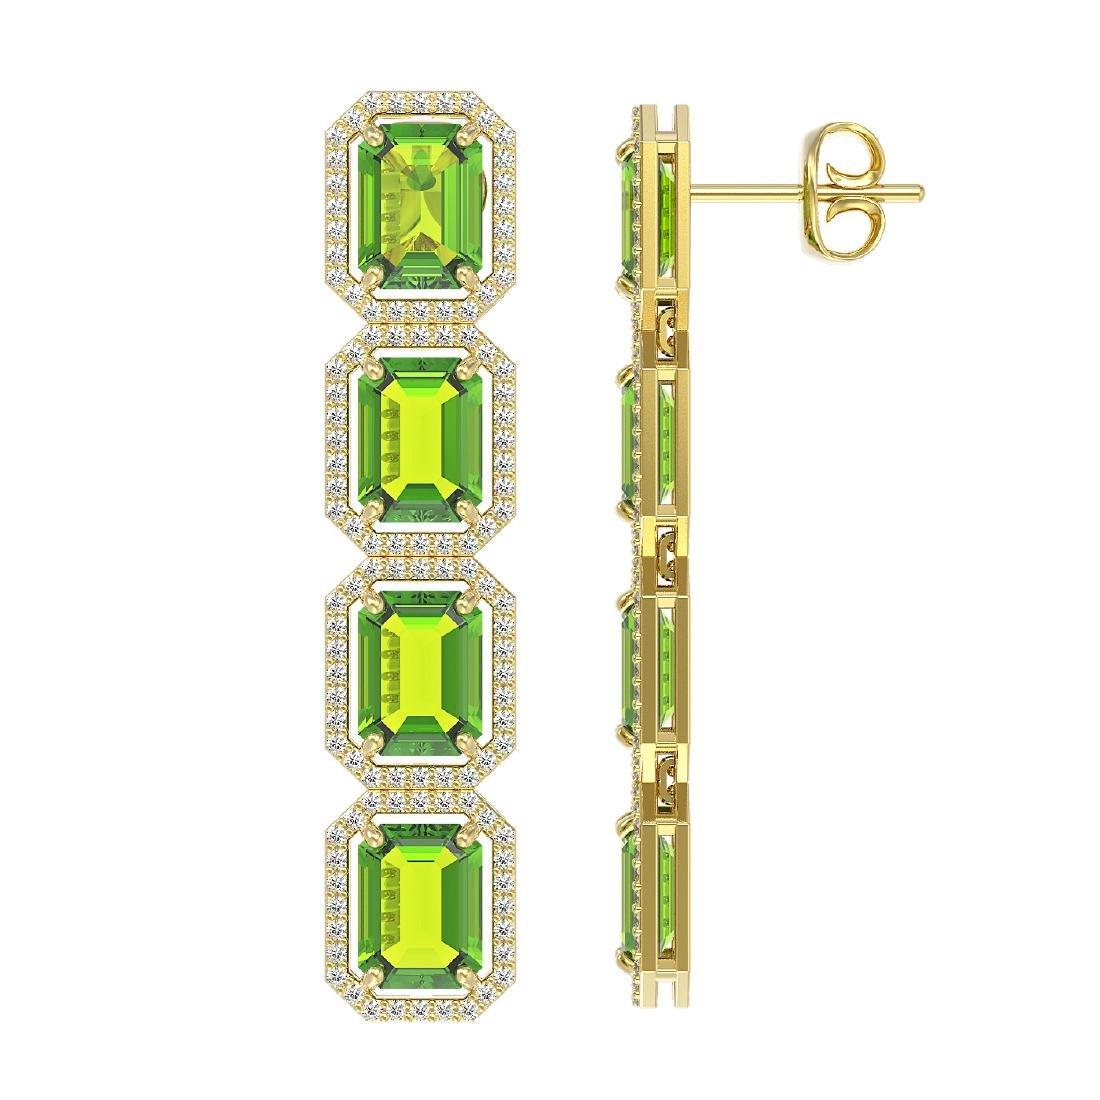 17.81 CTW Peridot & Diamond Halo Earrings 10K Yellow - 2